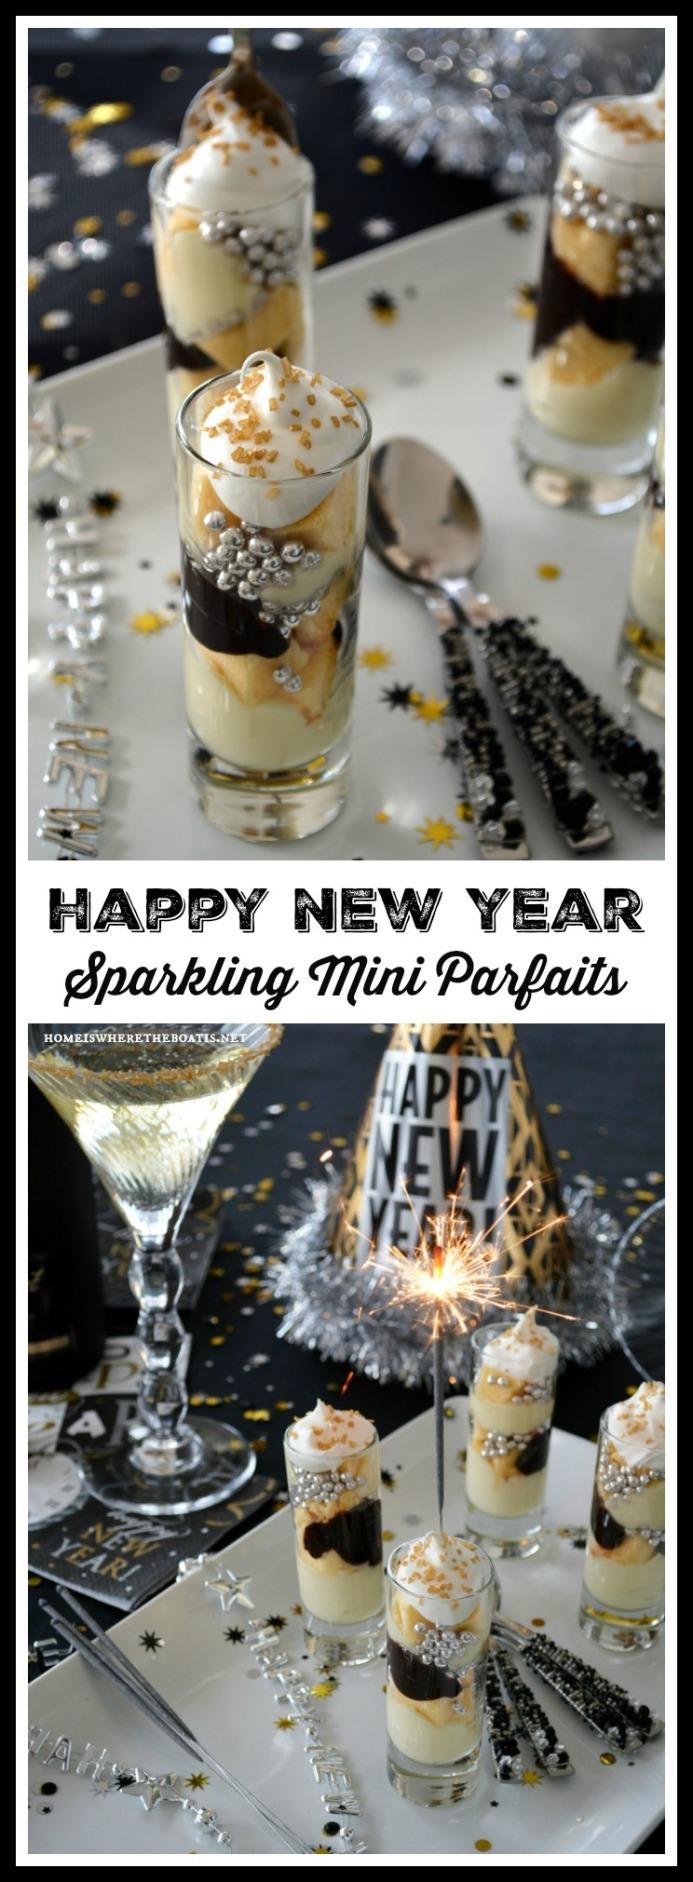 Happy New Year Sparkling Mini Parfaits